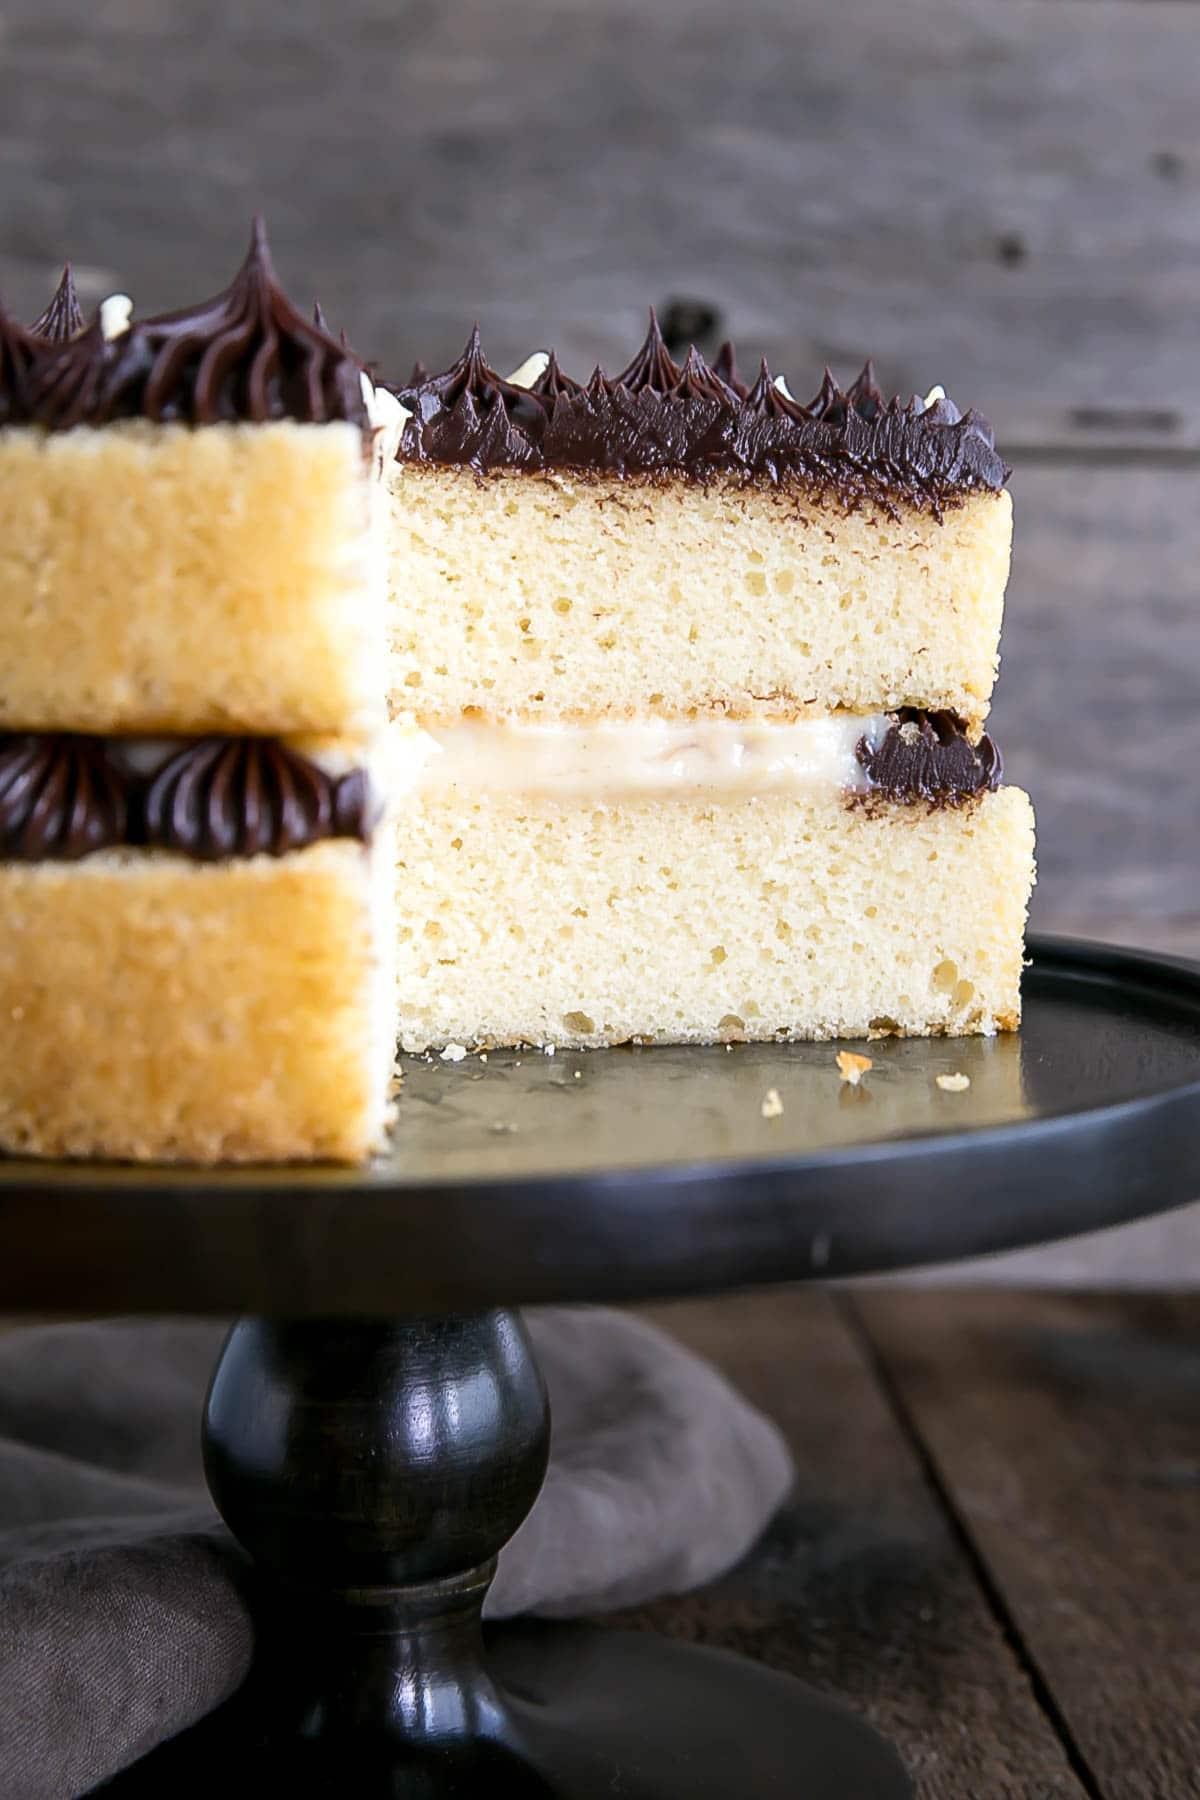 Boston Cream Pie with pastry cream and chocolate ganache